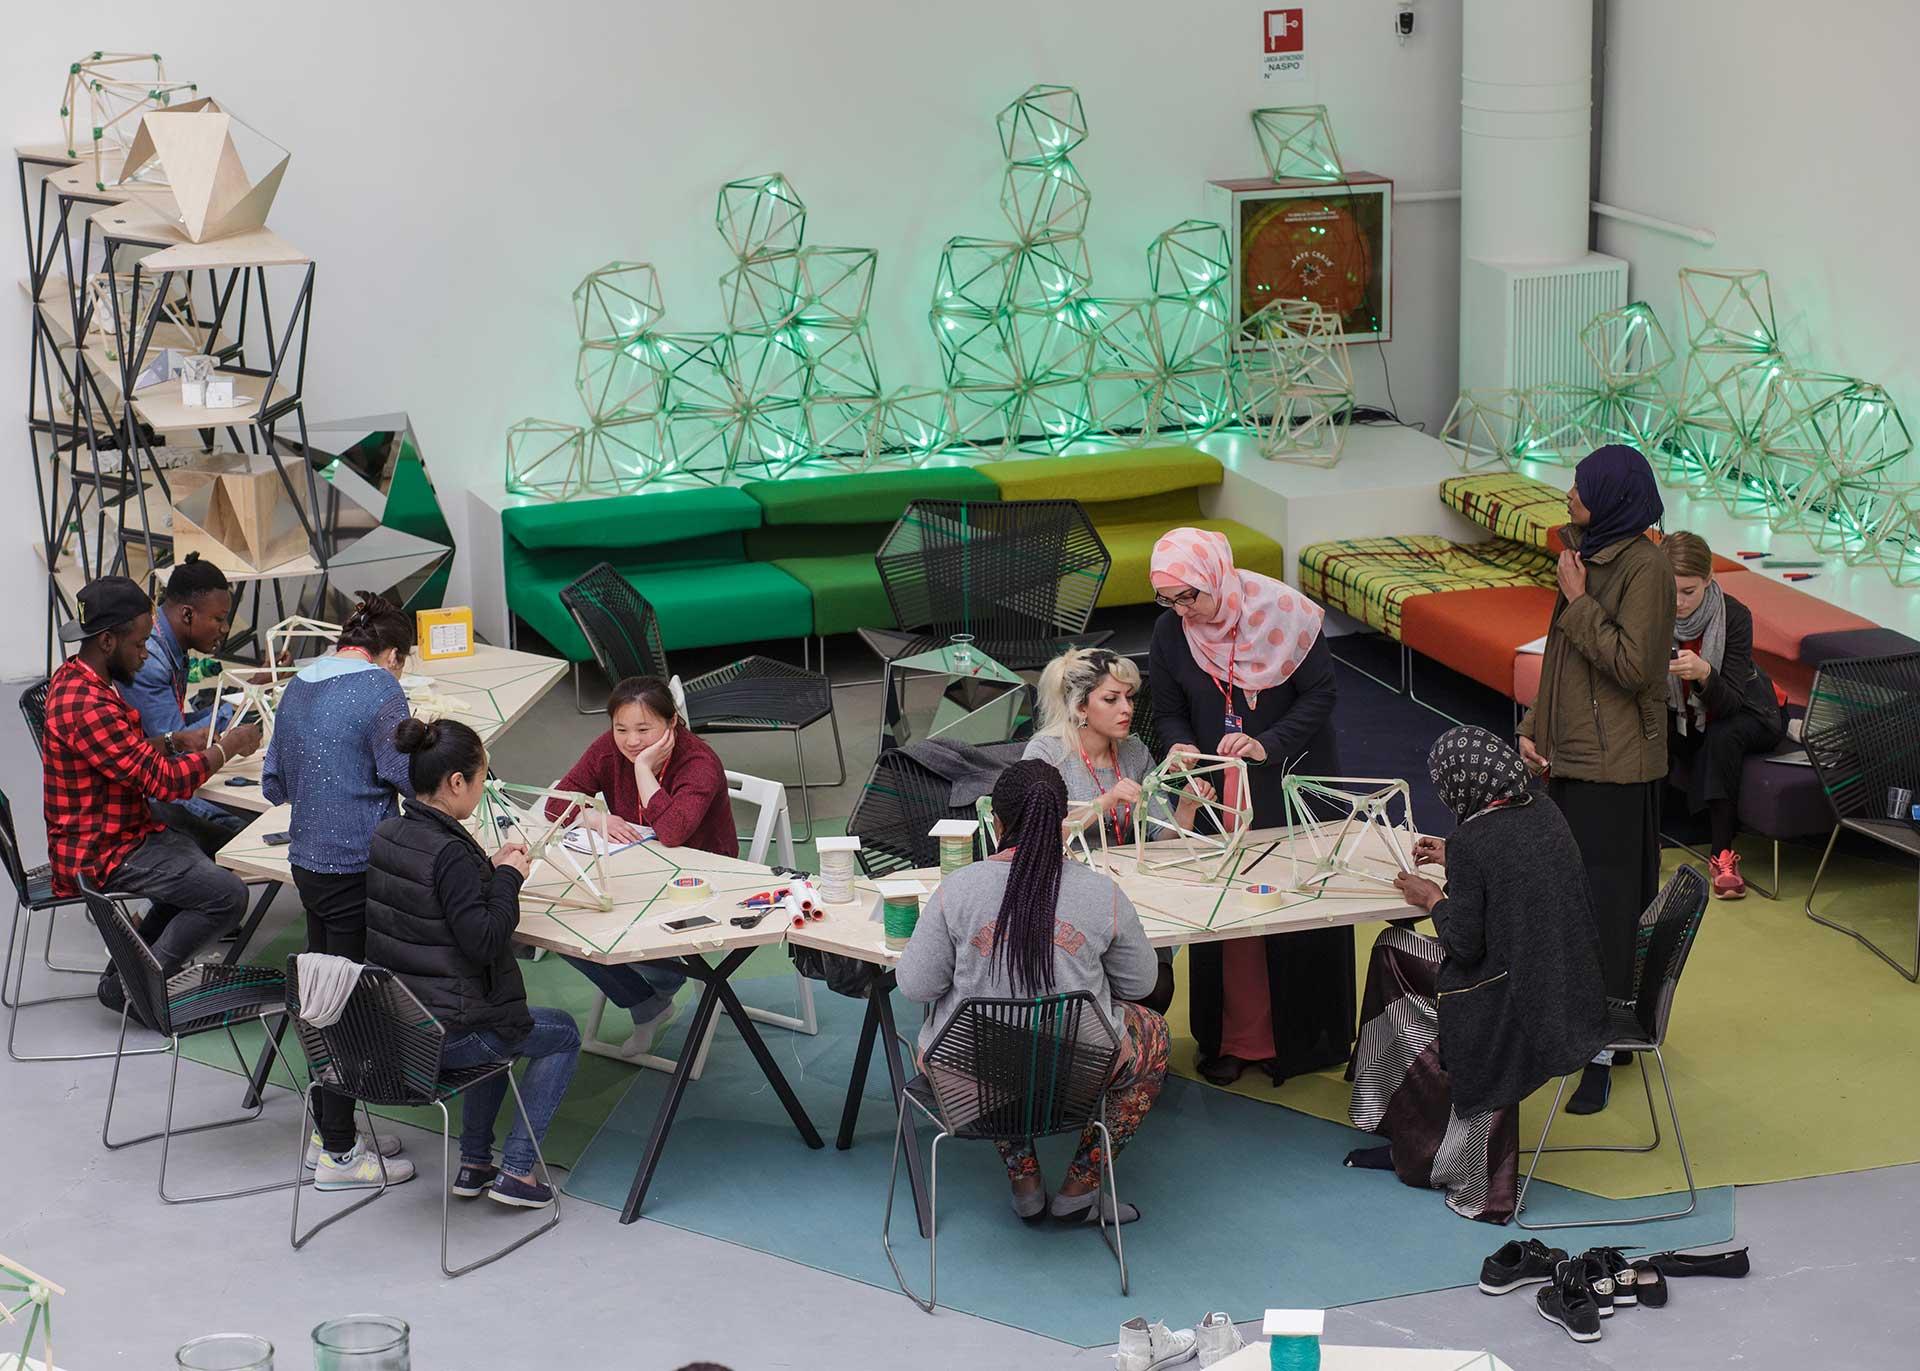 Olafur Eliasson: Green light, Thyssen-Bomemisza Art Contemporary, Biennale di Venezia